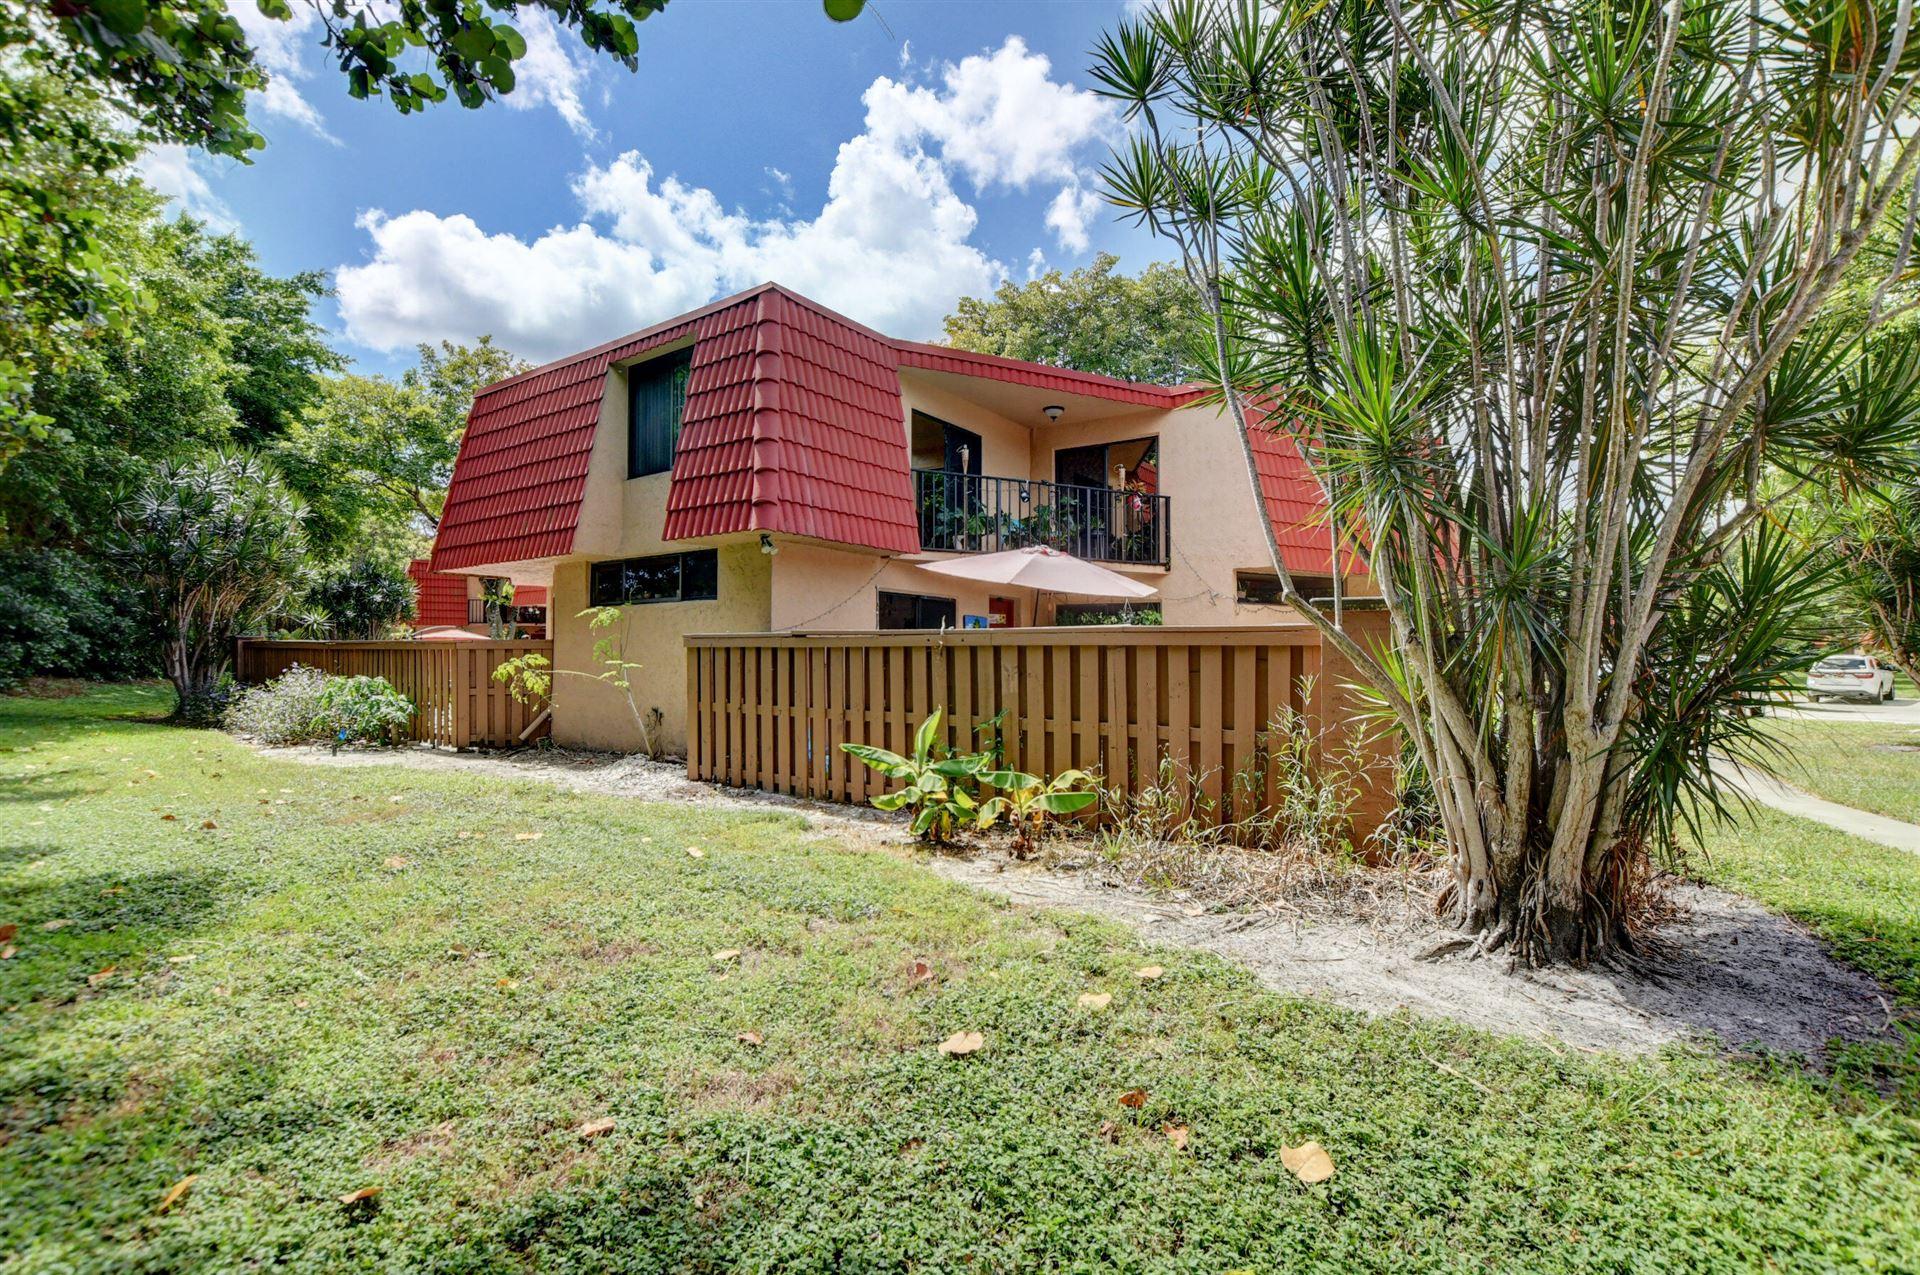 8123 Severn Drive #A, Boca Raton, FL 33433 - MLS#: RX-10750153